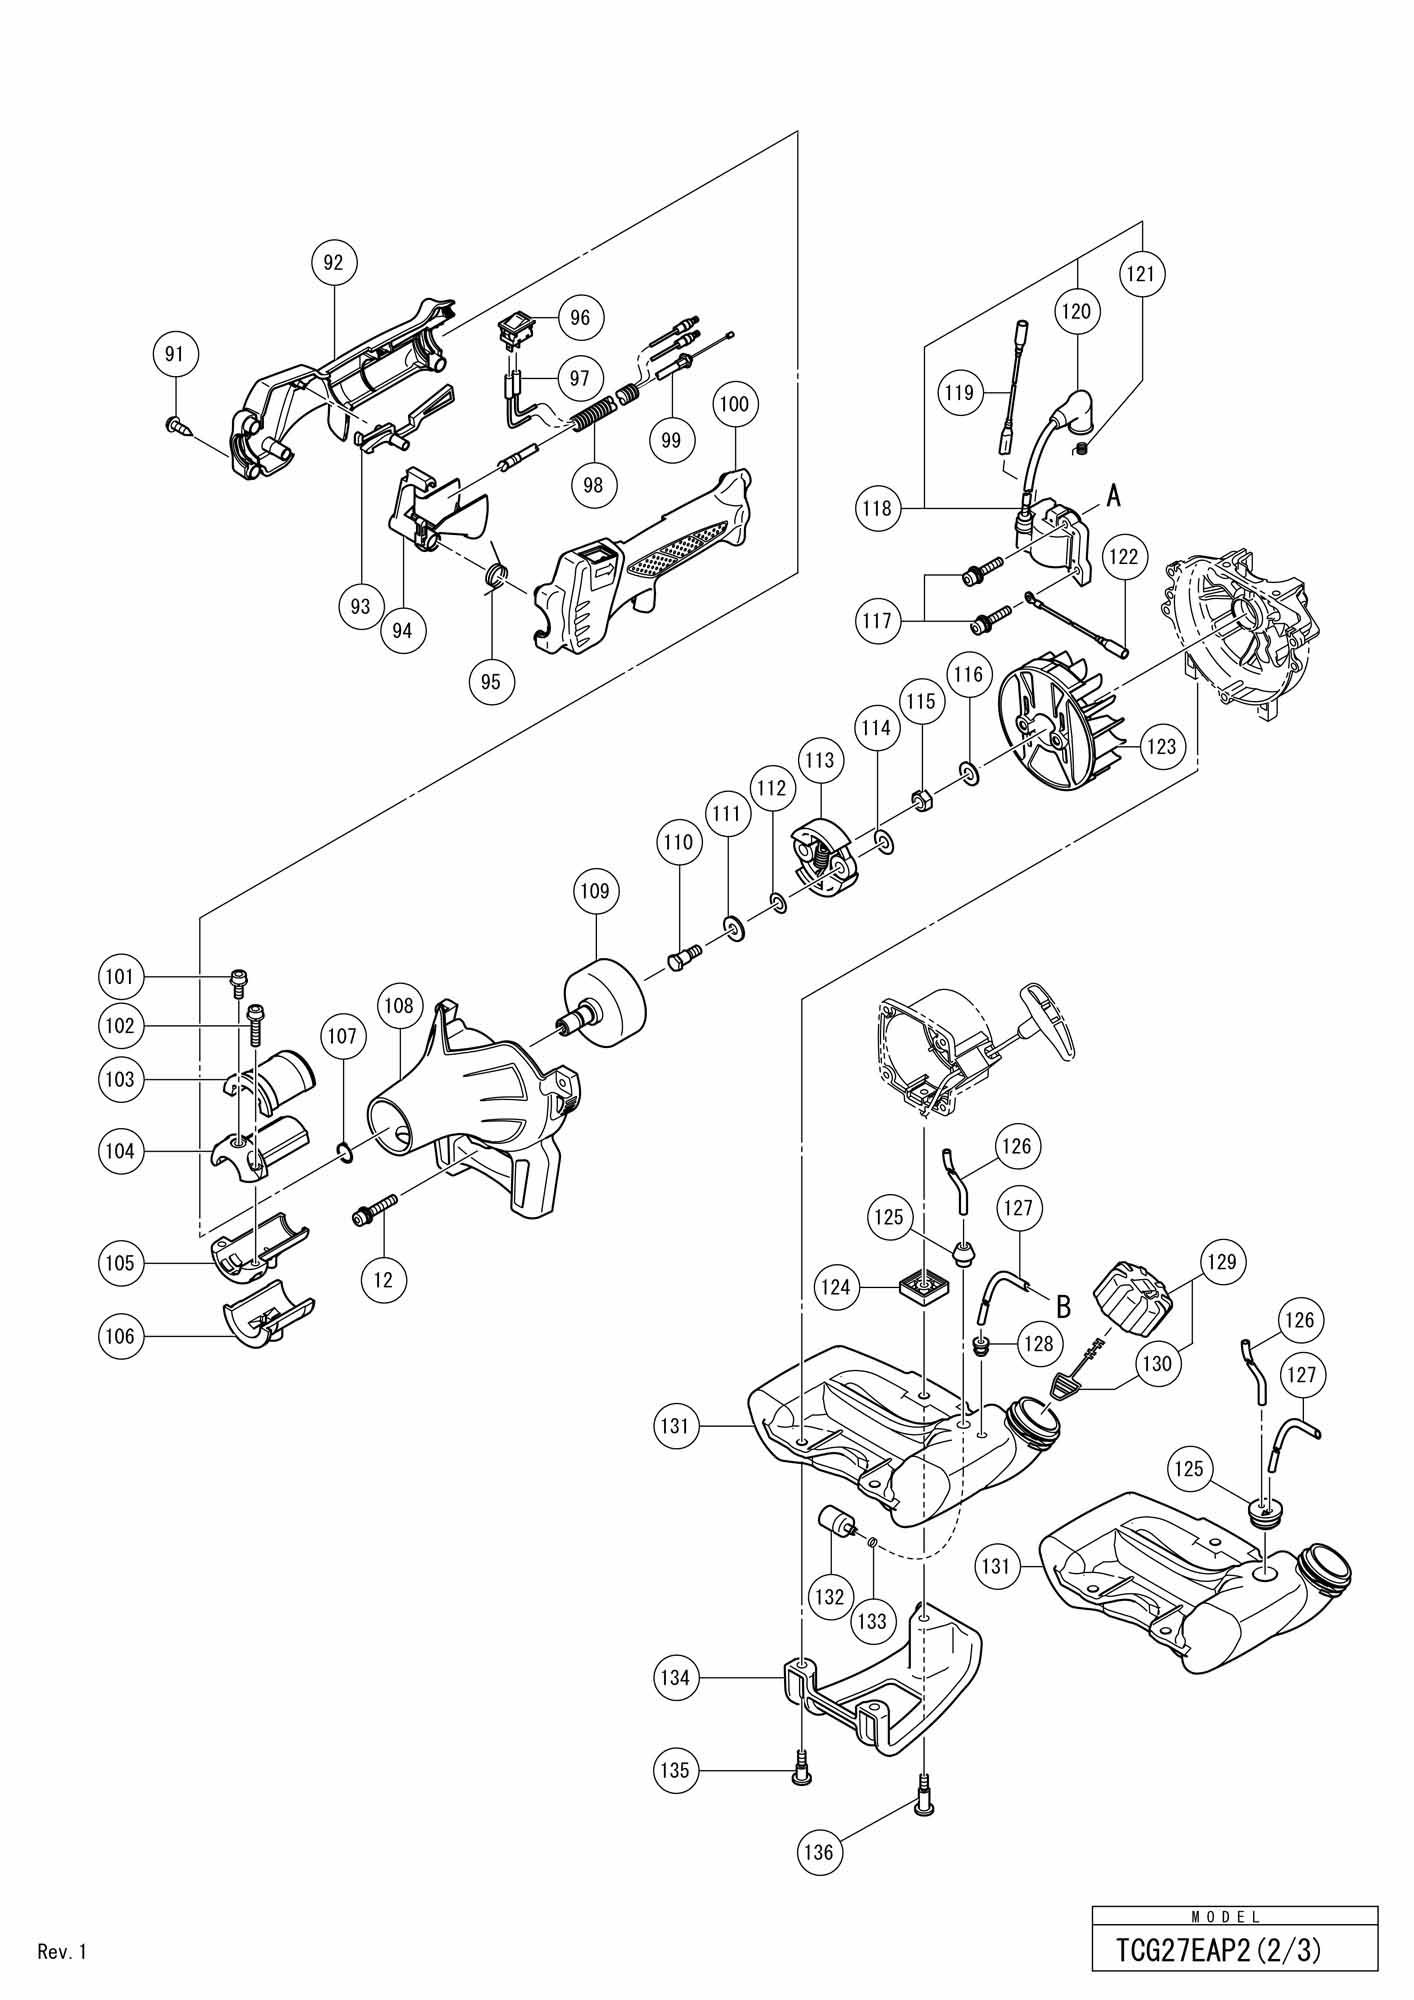 Hitachi Engine Grass Trimmer Tcg 27eap2 SPARE_TCG27EAP2